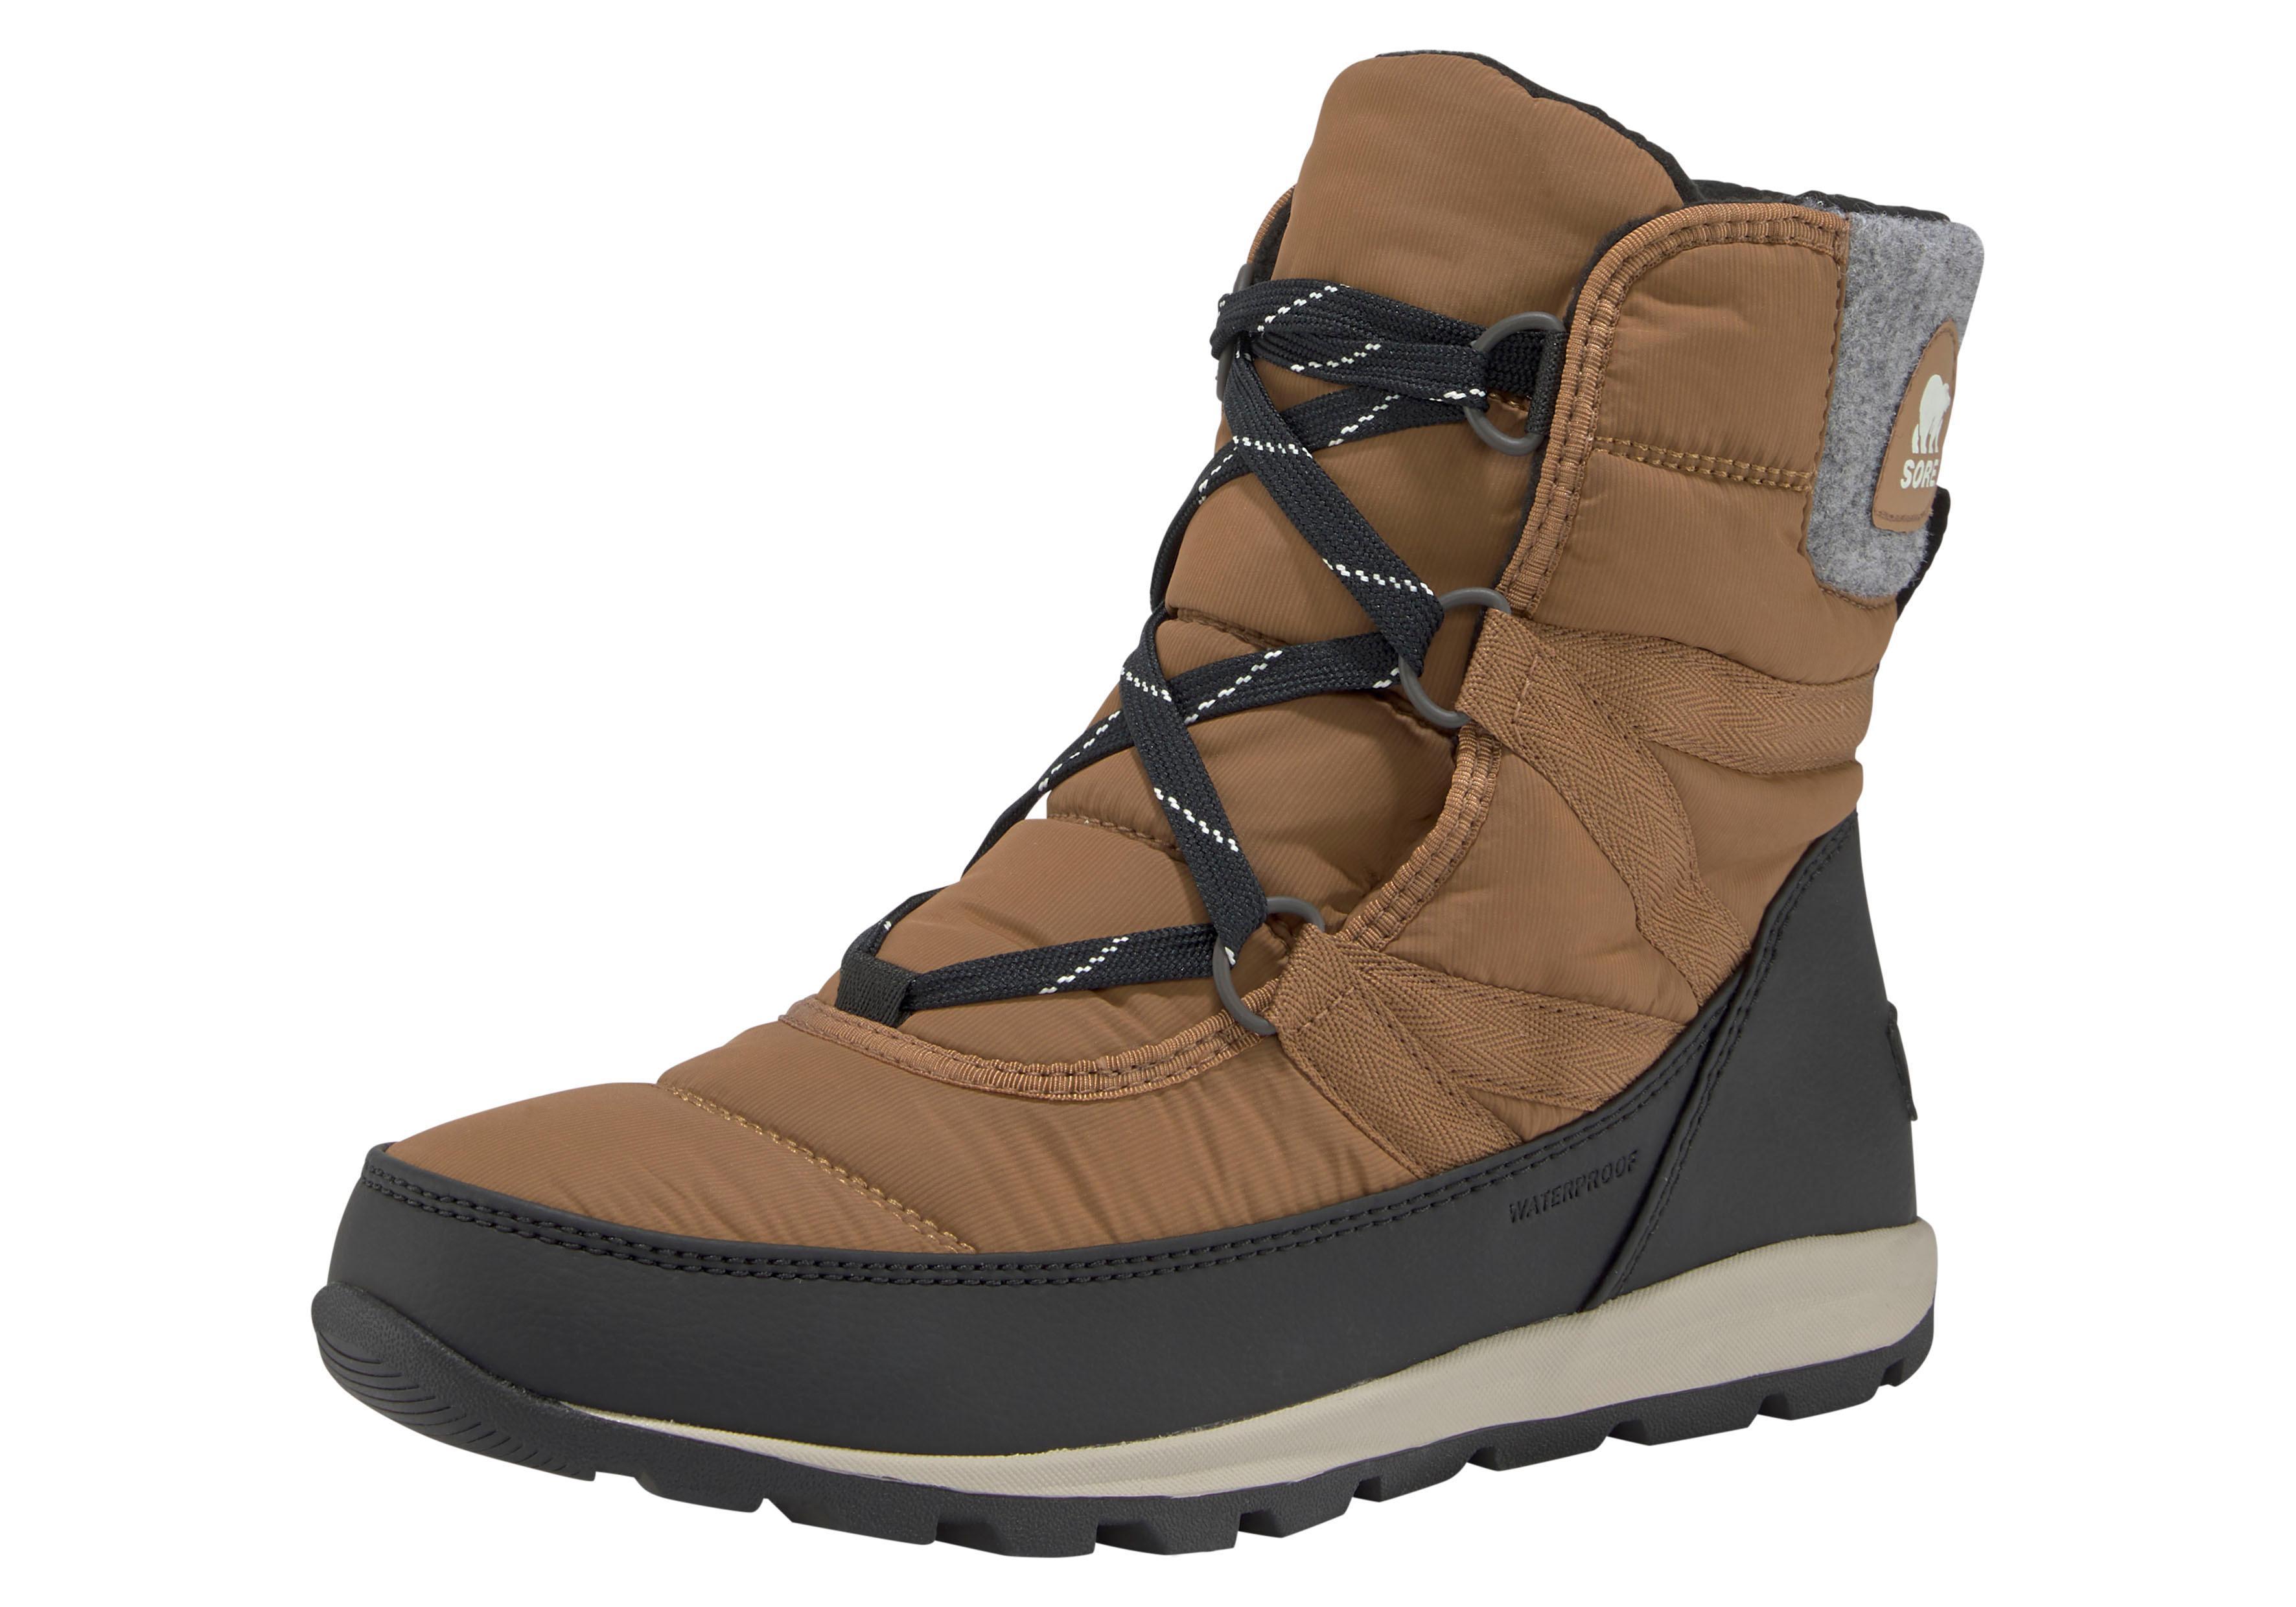 Sorel Outdoorwinterstiefel WHITNEY™ SHORT LACE | Schuhe > Outdoorschuhe | Braun | Sorel